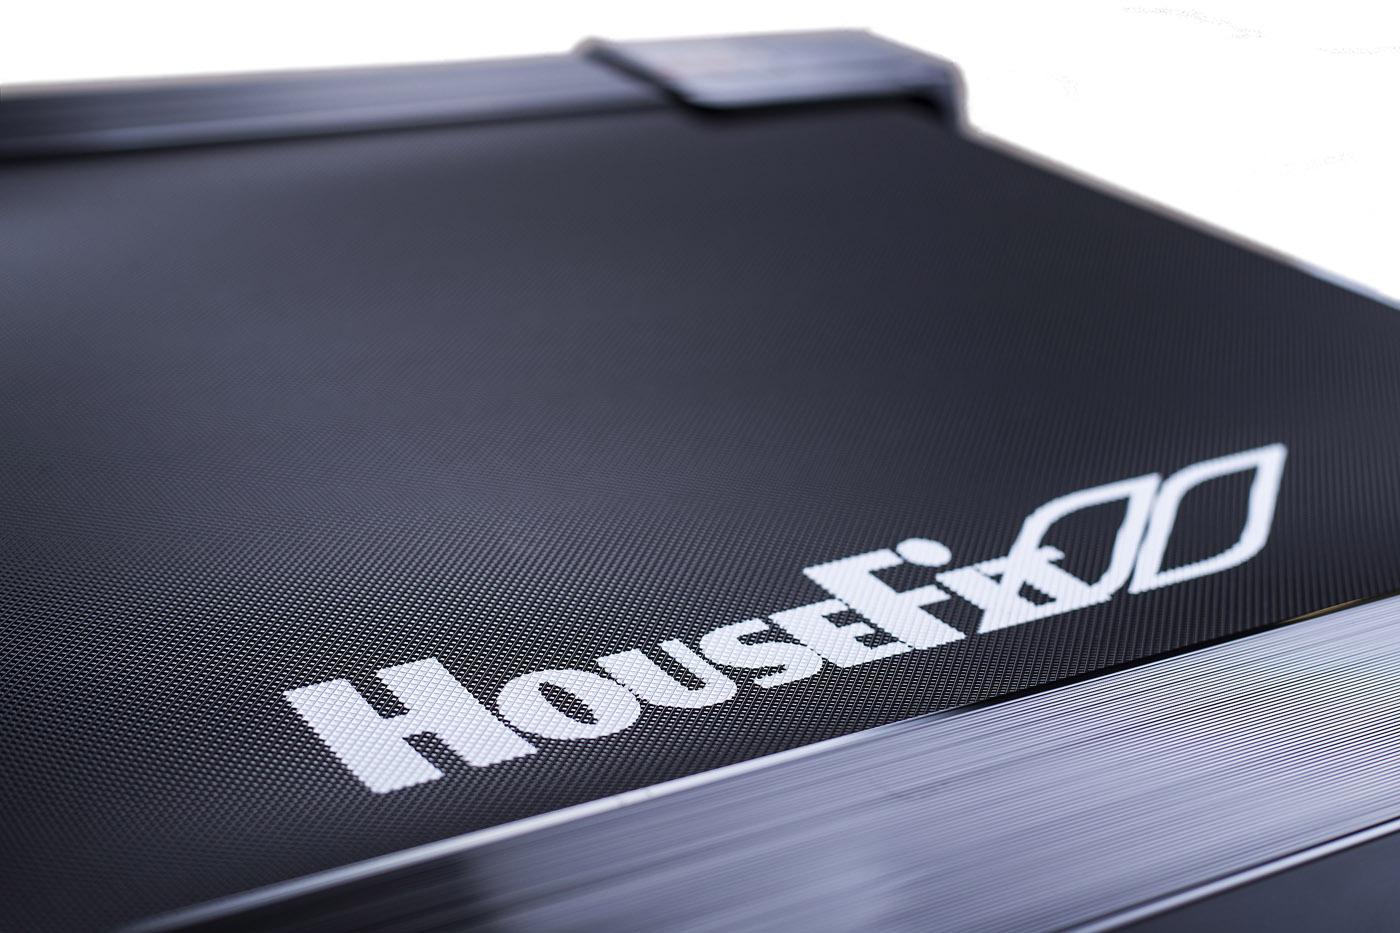 HouseFit SPIRO 20_11